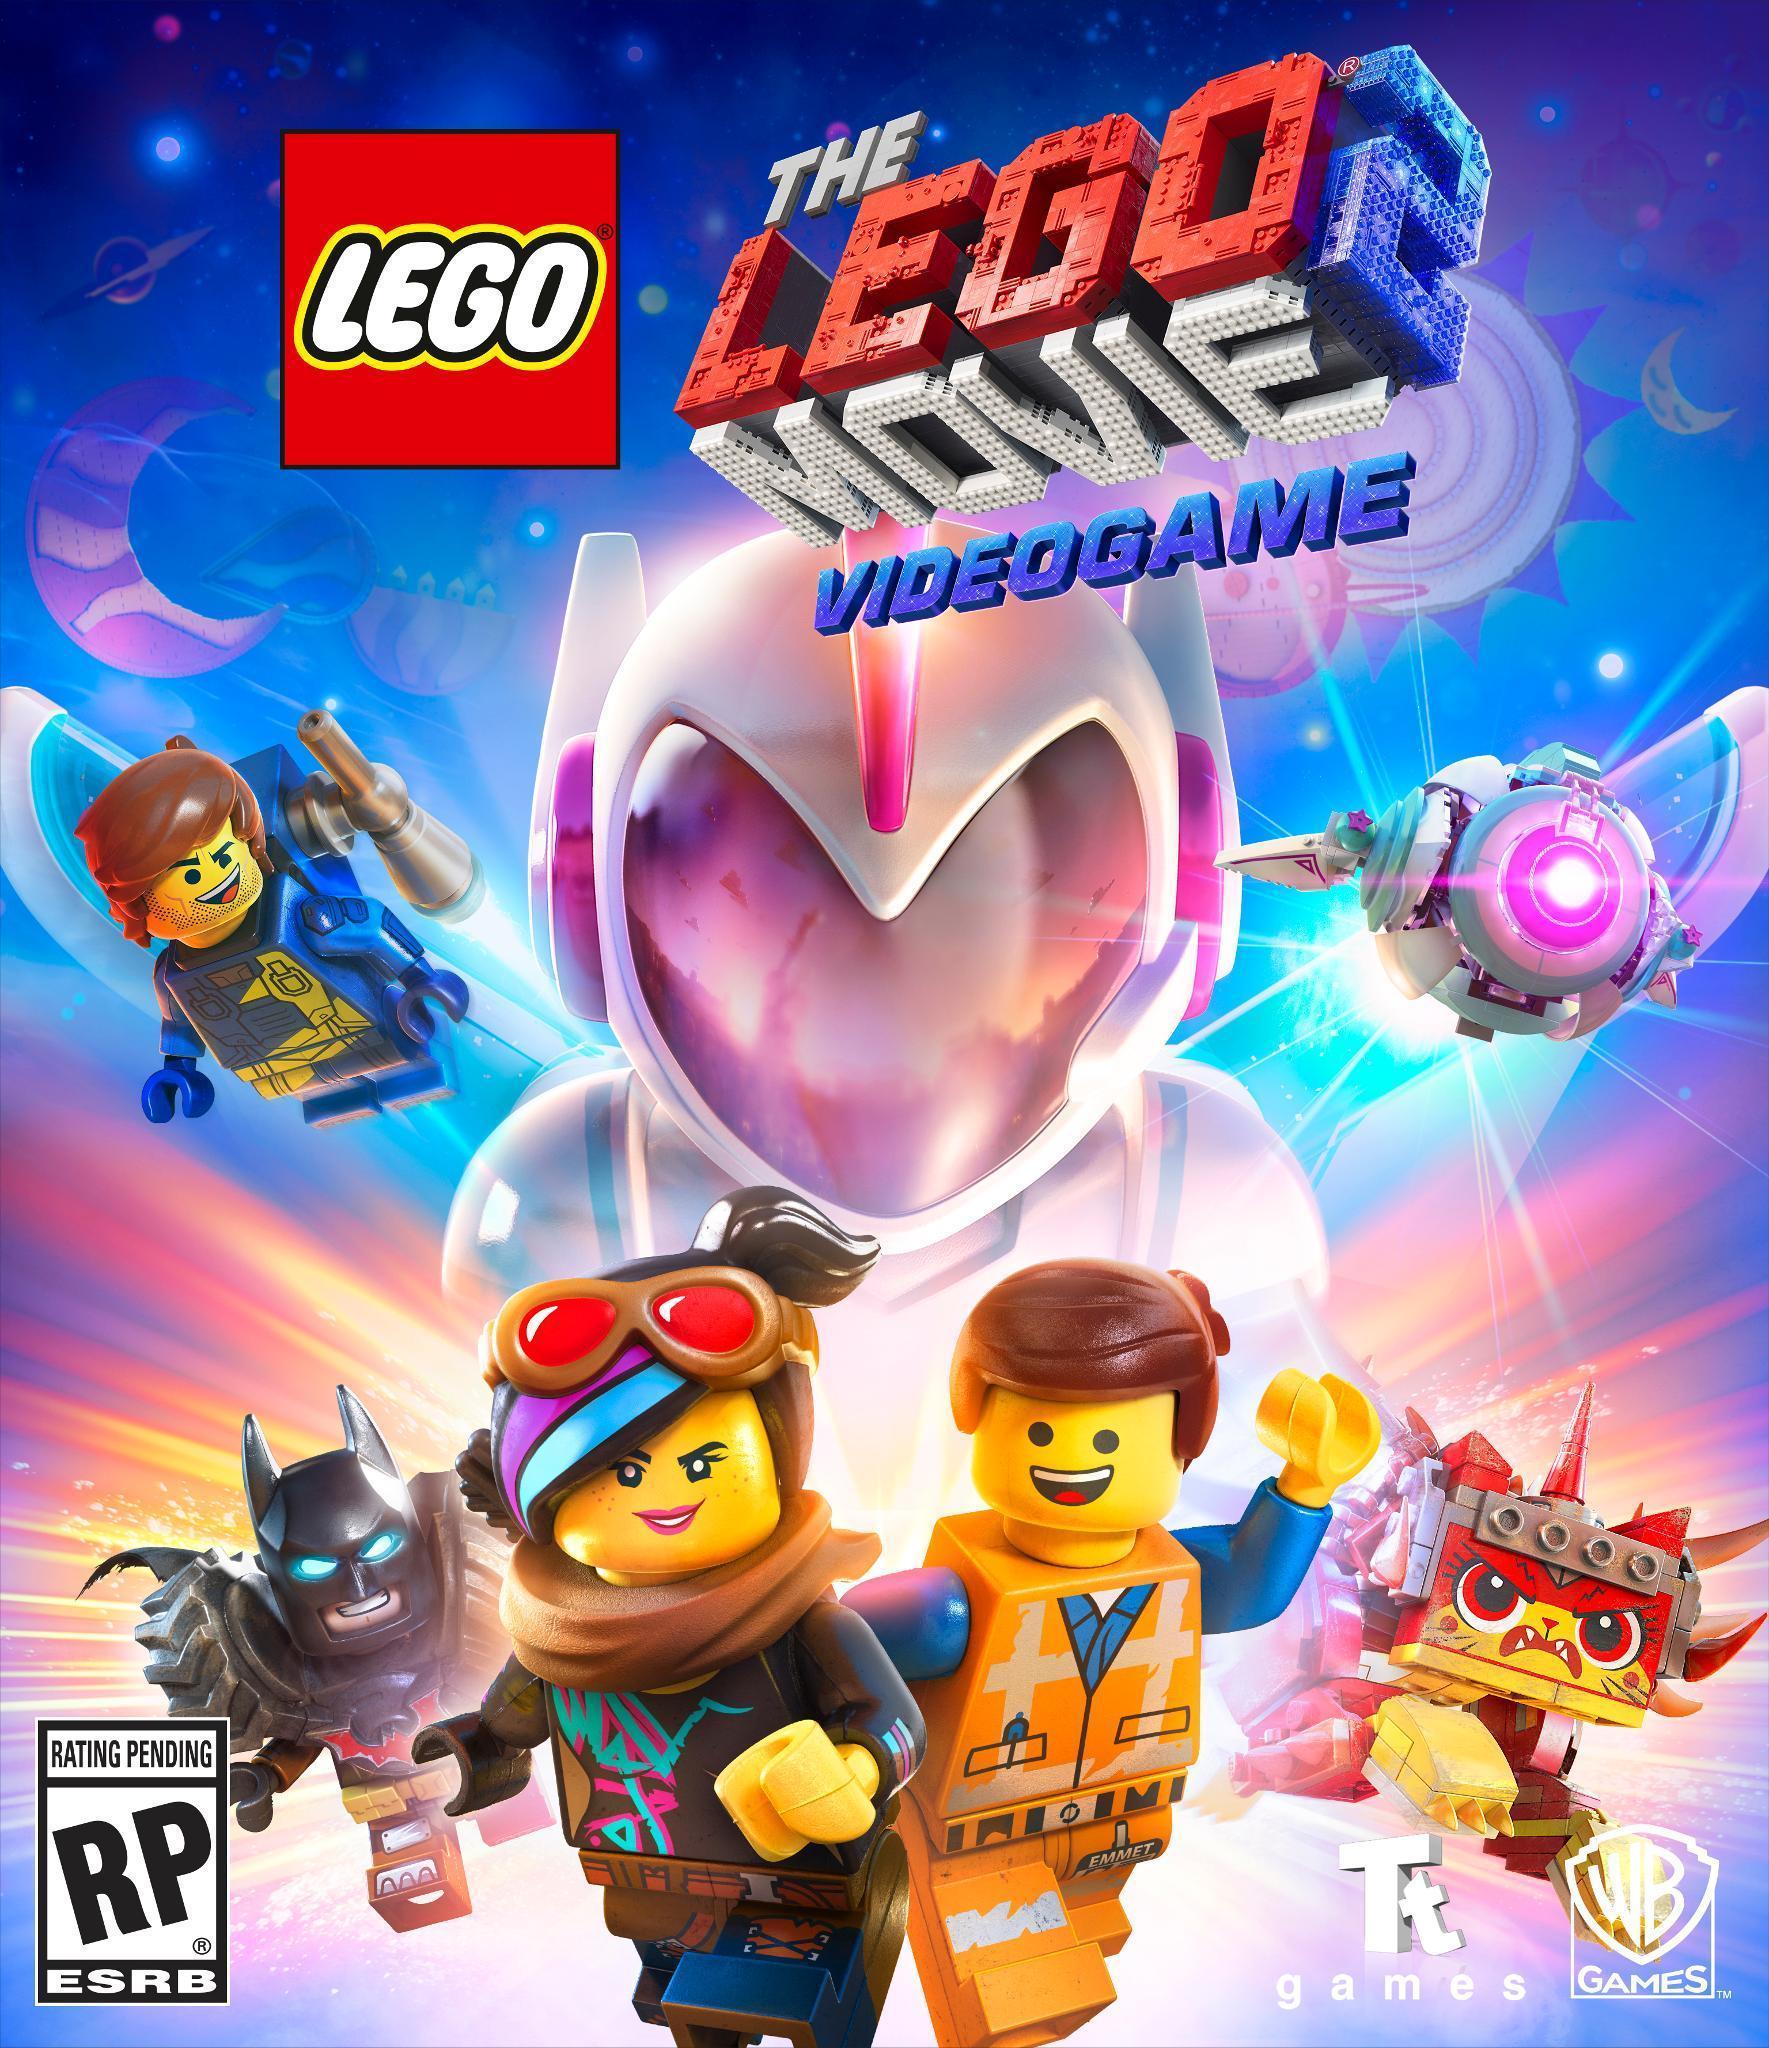 The Lego Movie 2 Videogame Video Game 2019 Imdb